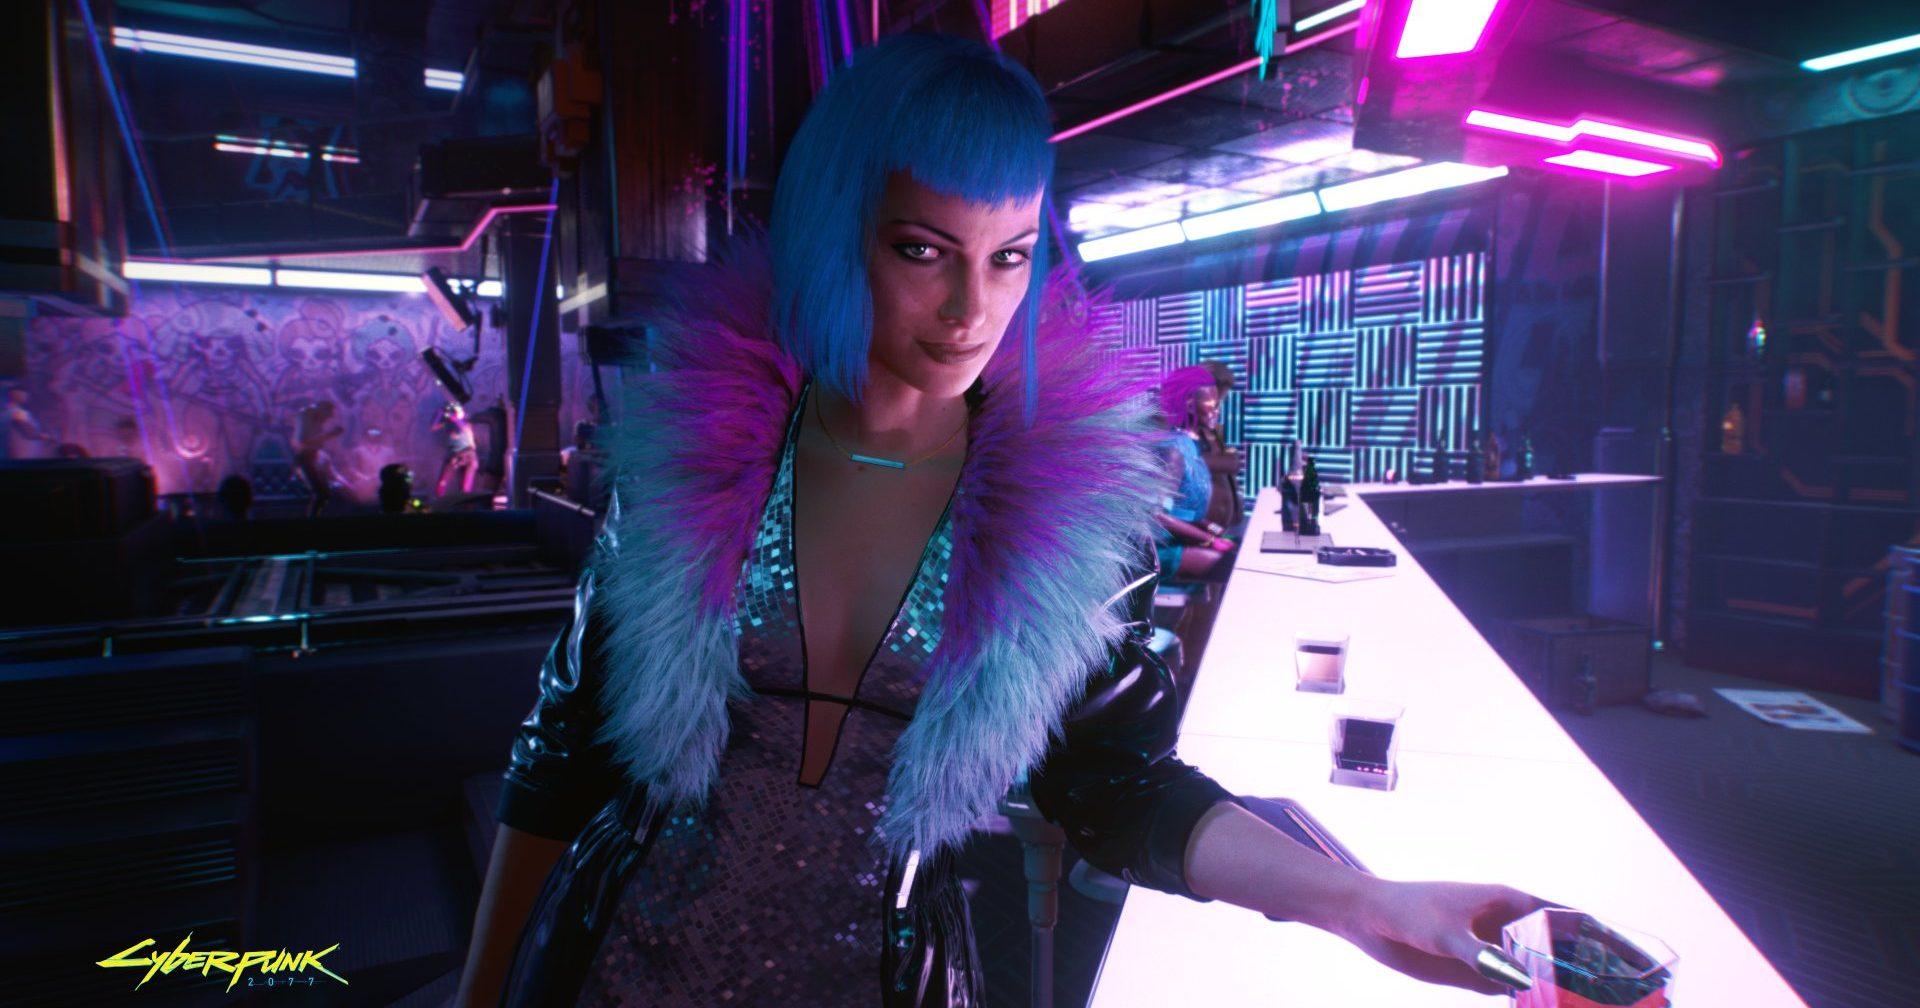 Cyberpunk2077_My_name_is_Evelyn_RGB-en